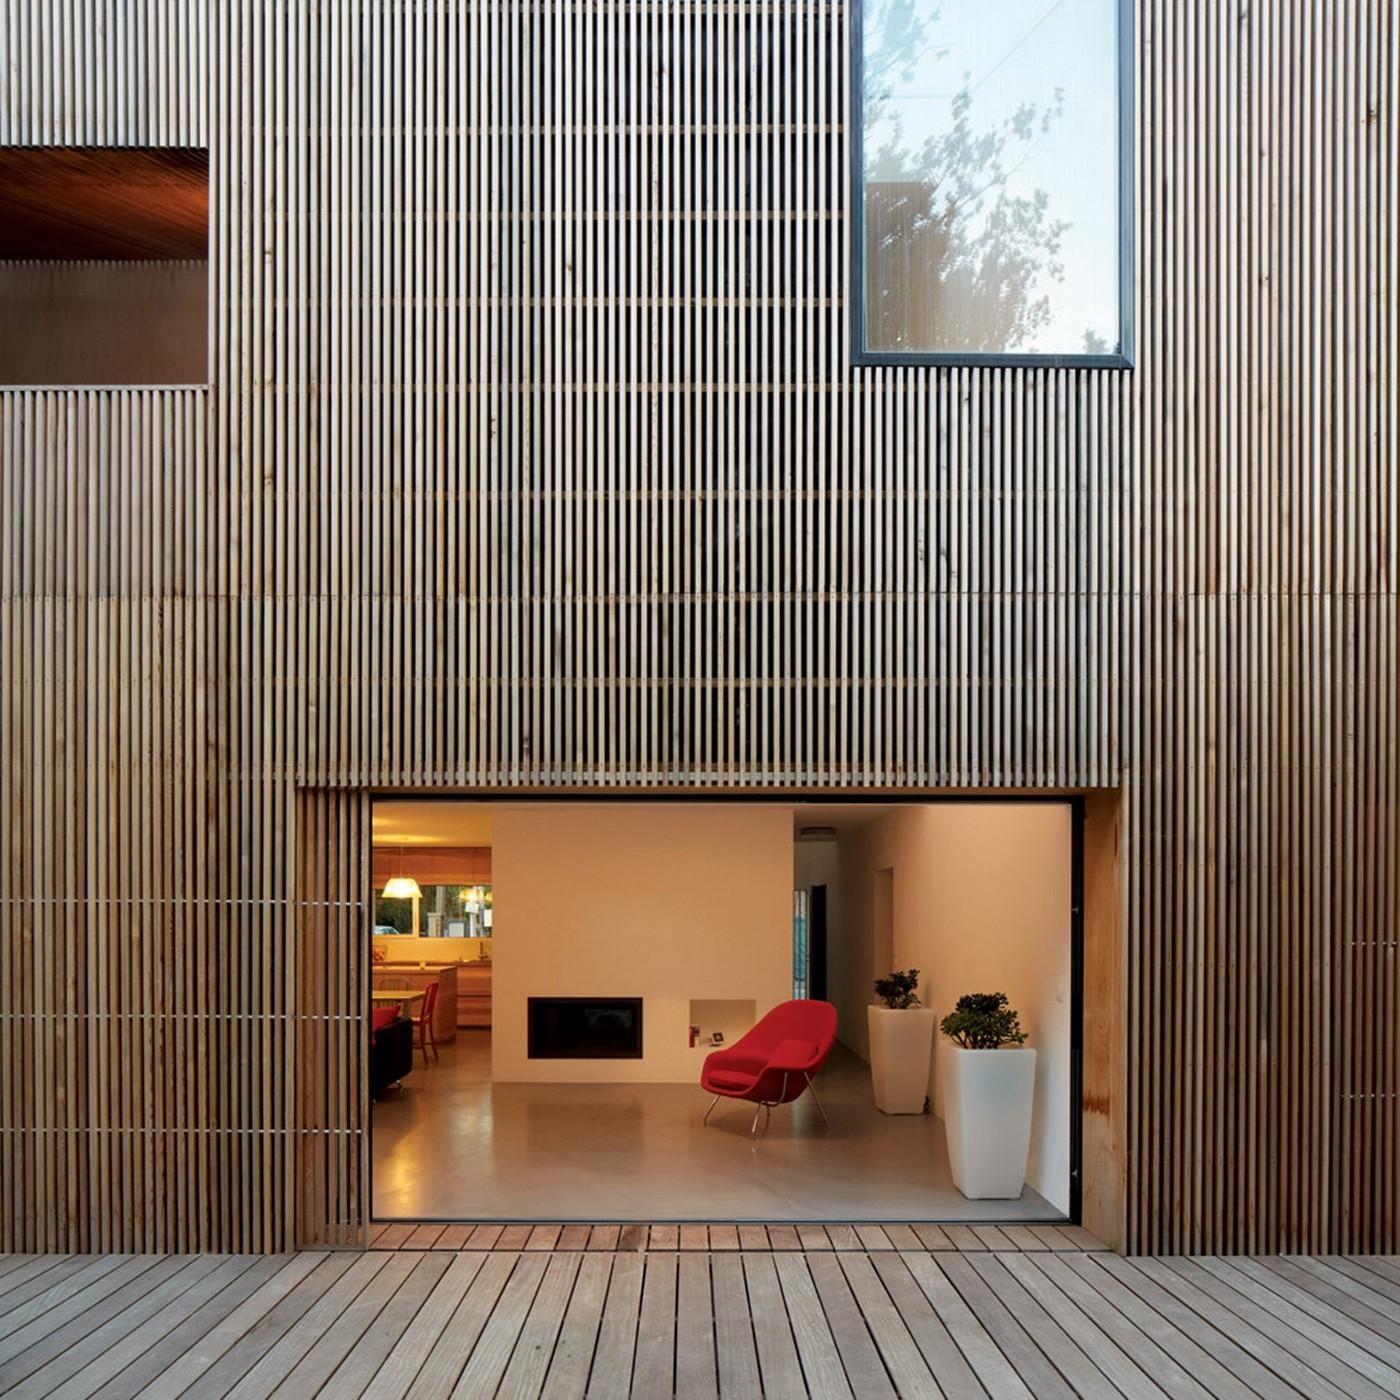 HOUSE 2G by Avenier Cornejo architectes